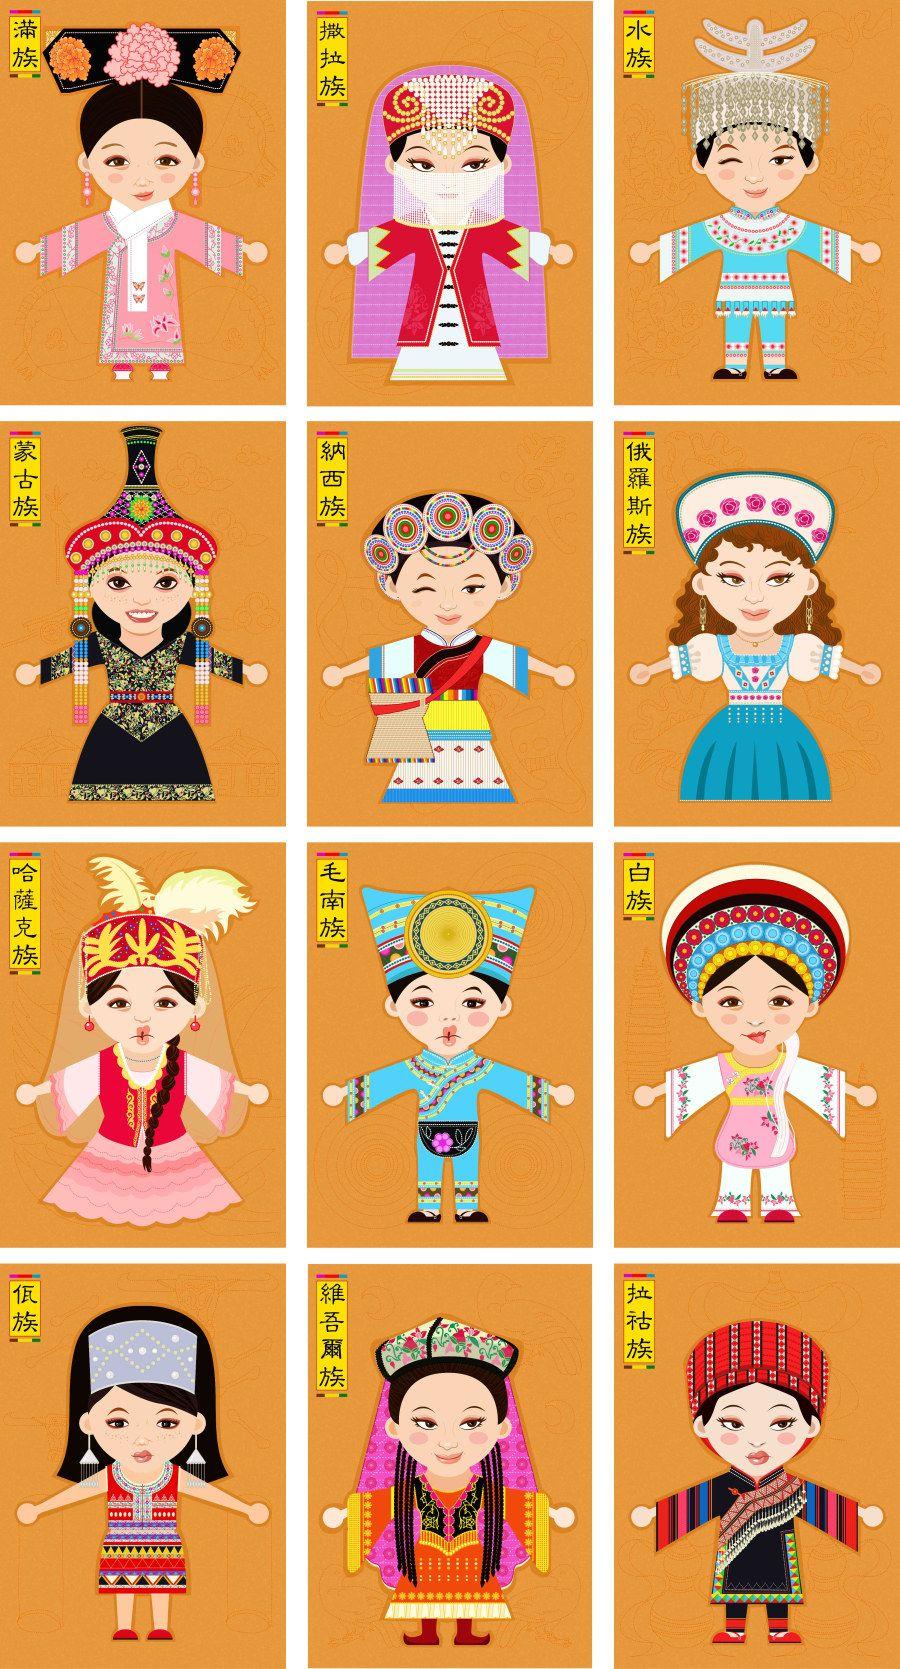 China clipart thing chinese. Minority ethnic people pinterest